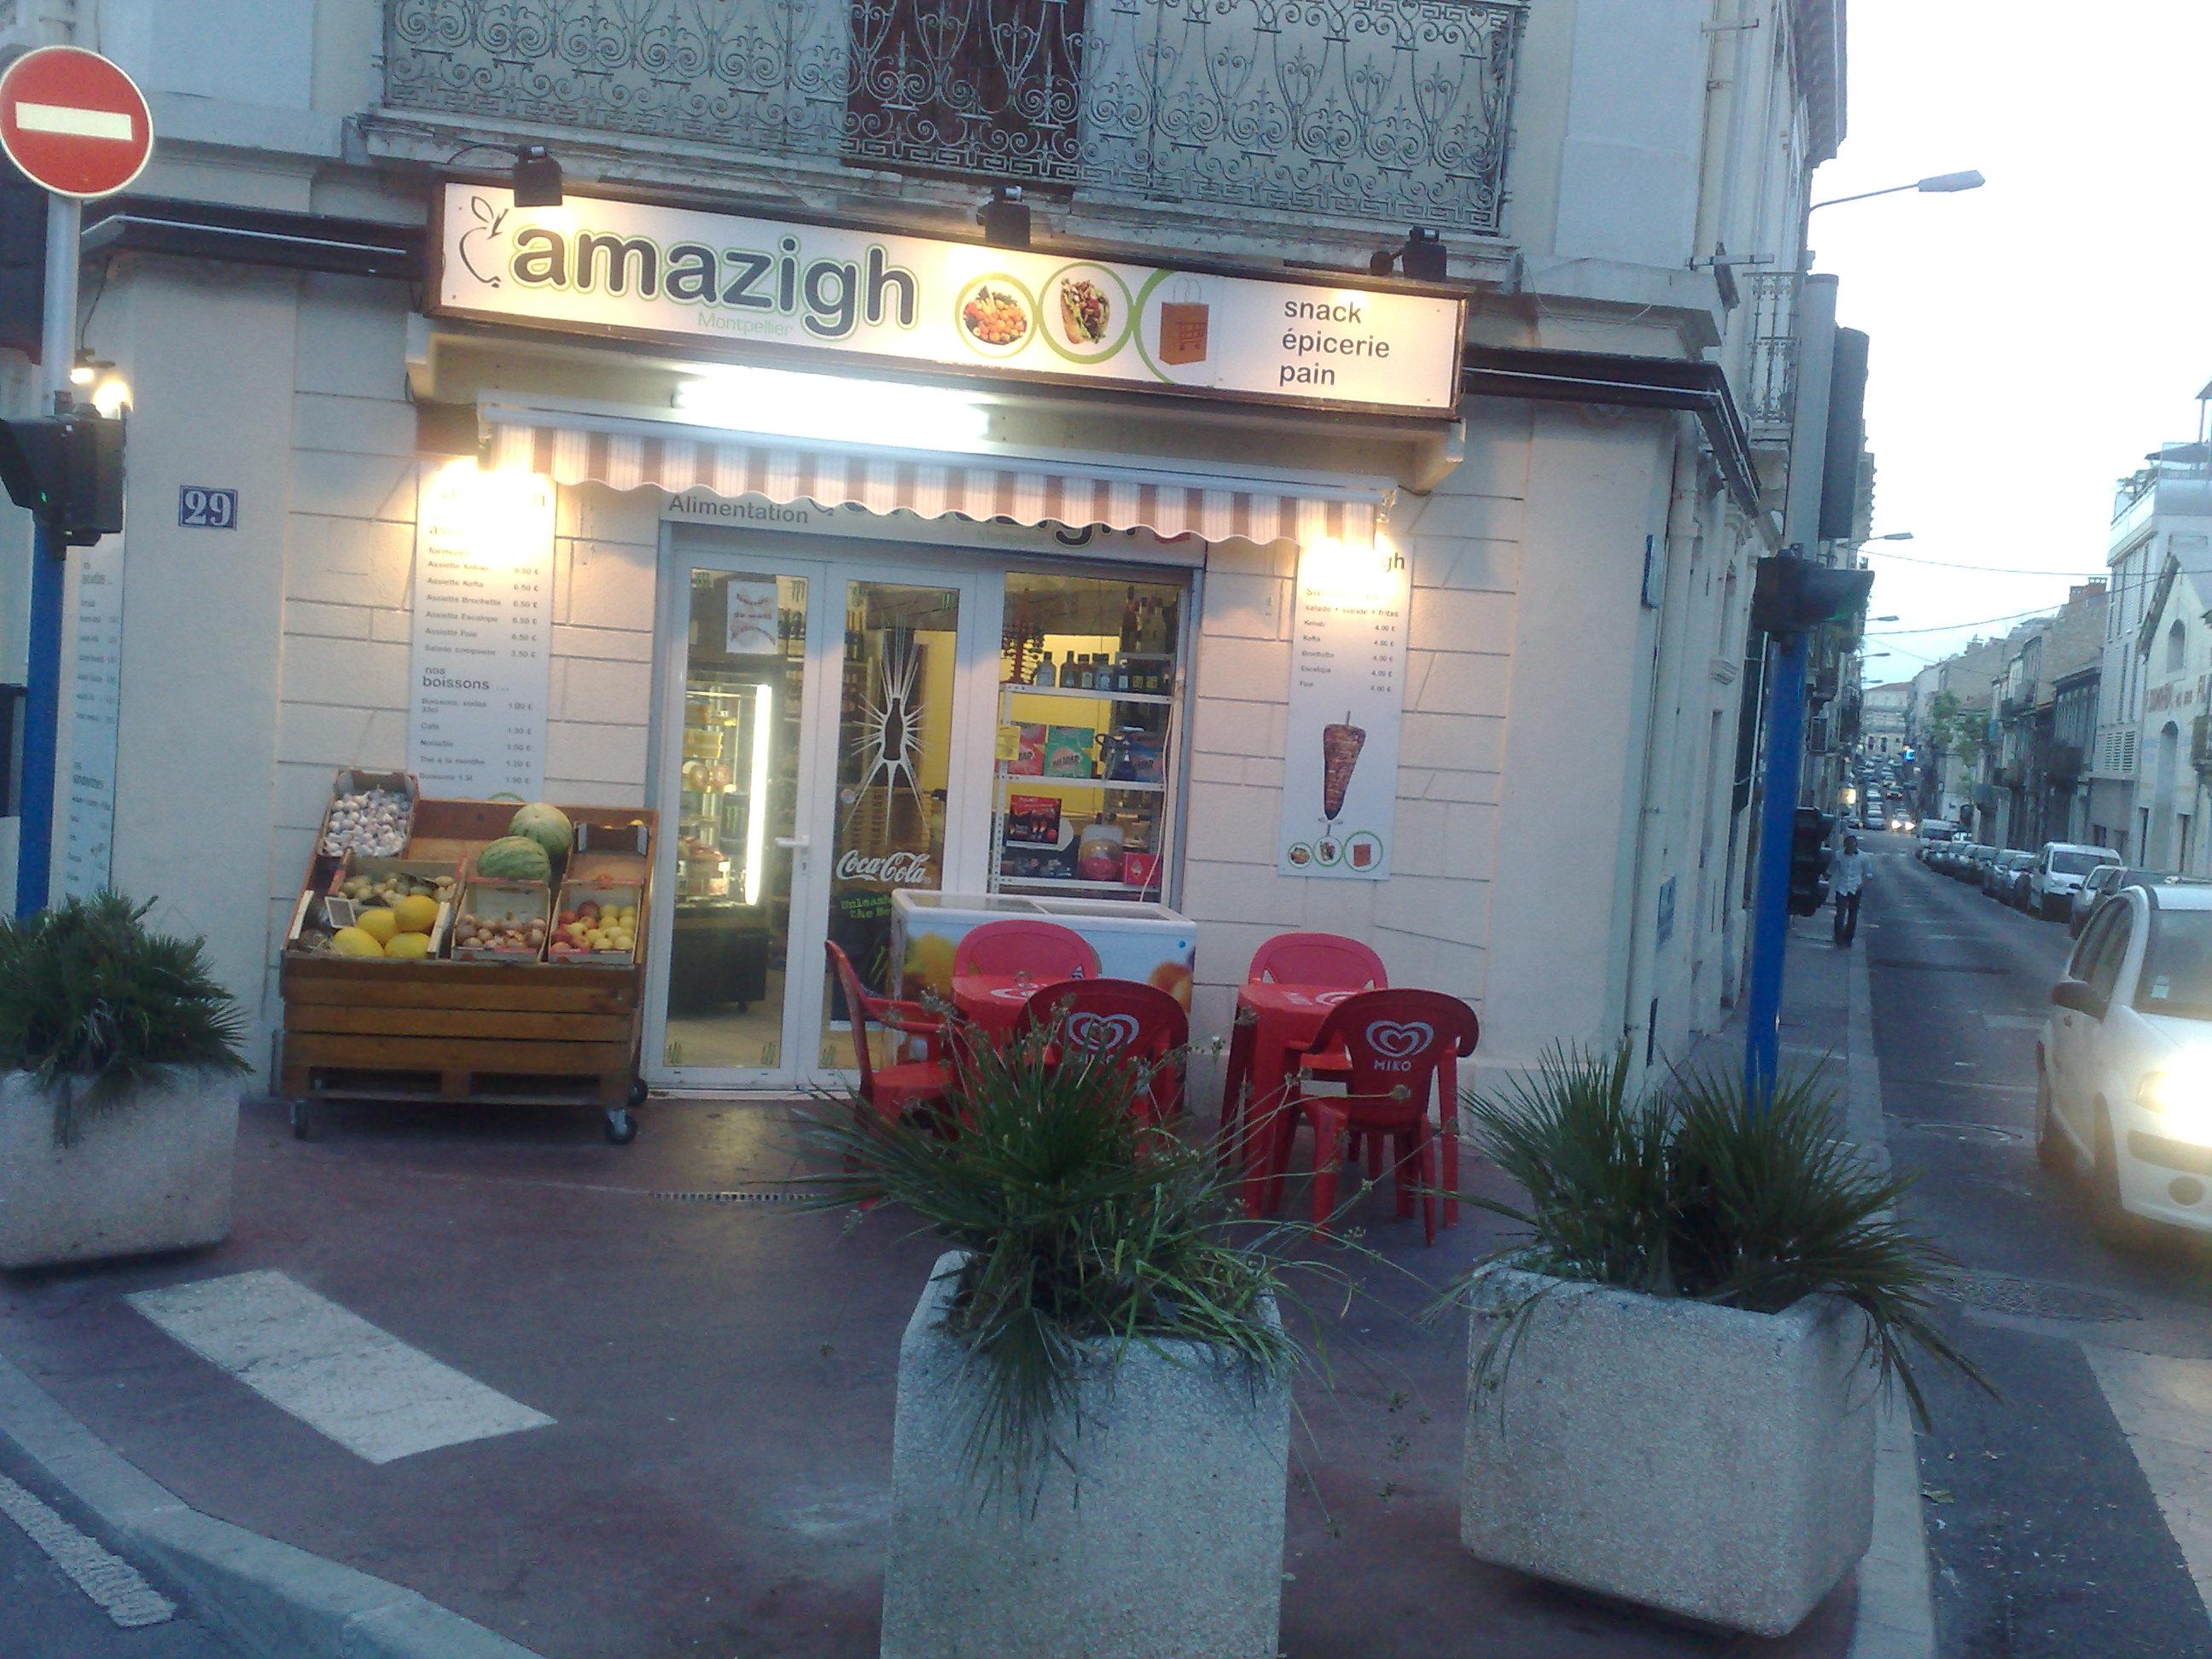 amazigh restaurant top. Black Bedroom Furniture Sets. Home Design Ideas